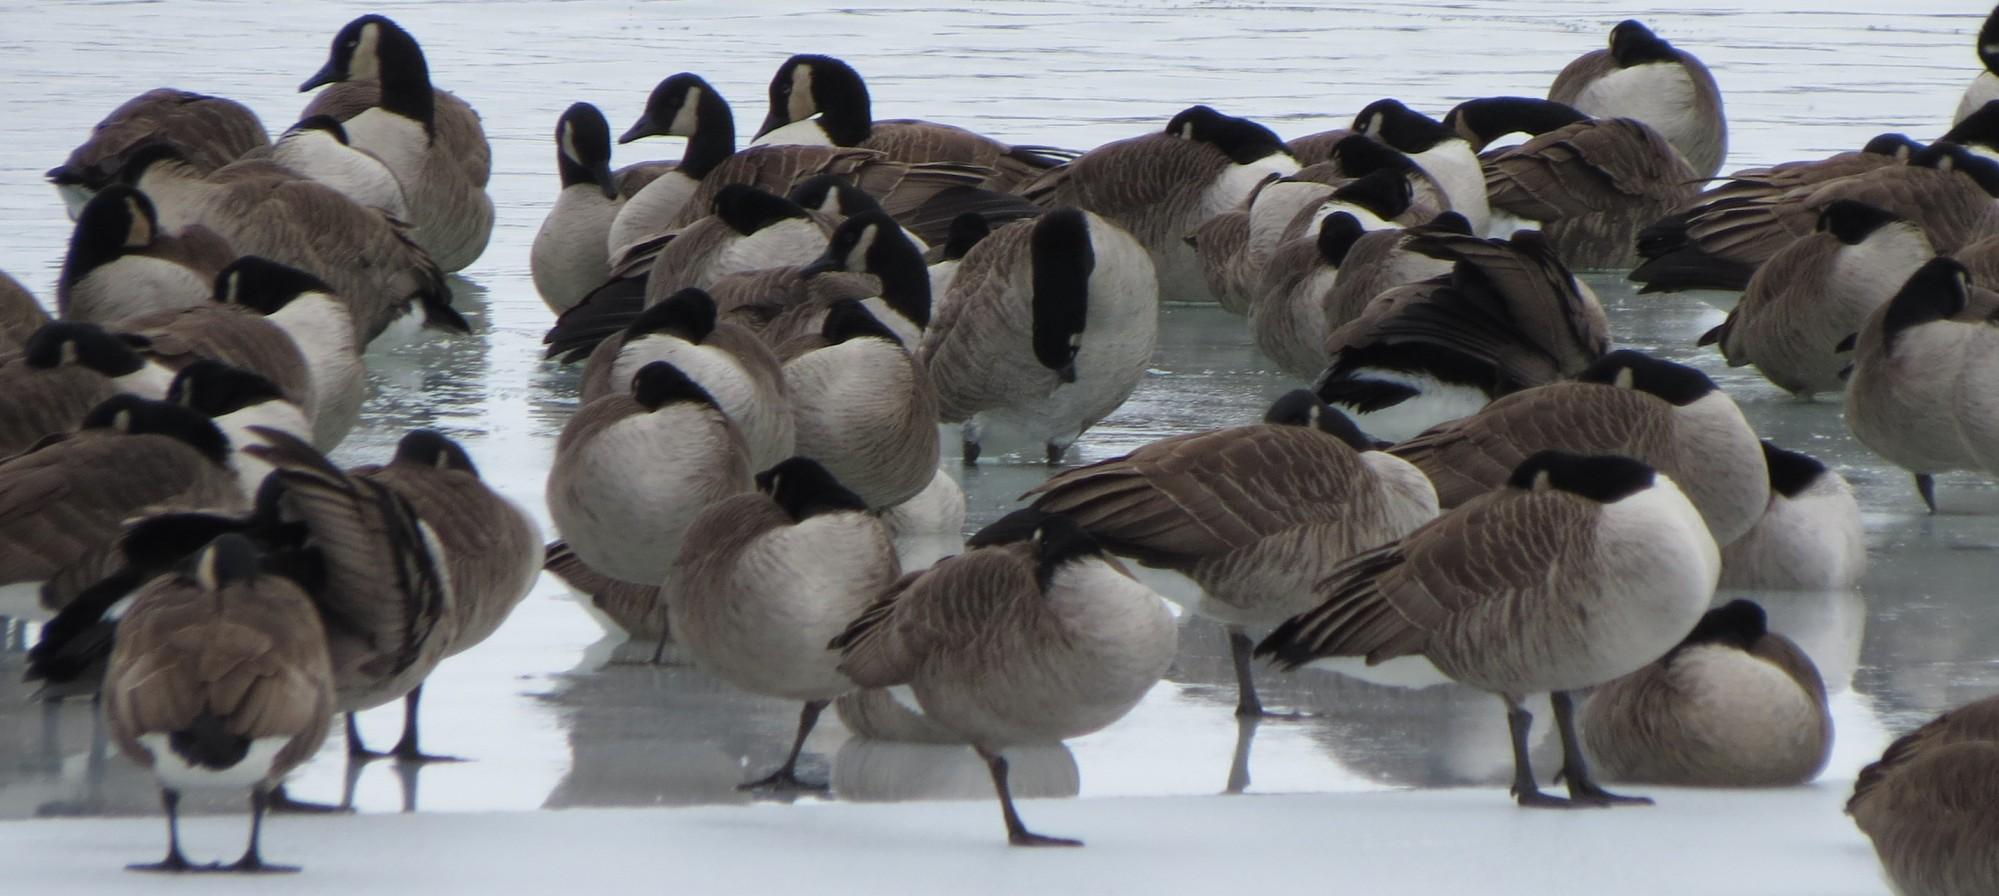 Canandaigua_Pier-Ducks